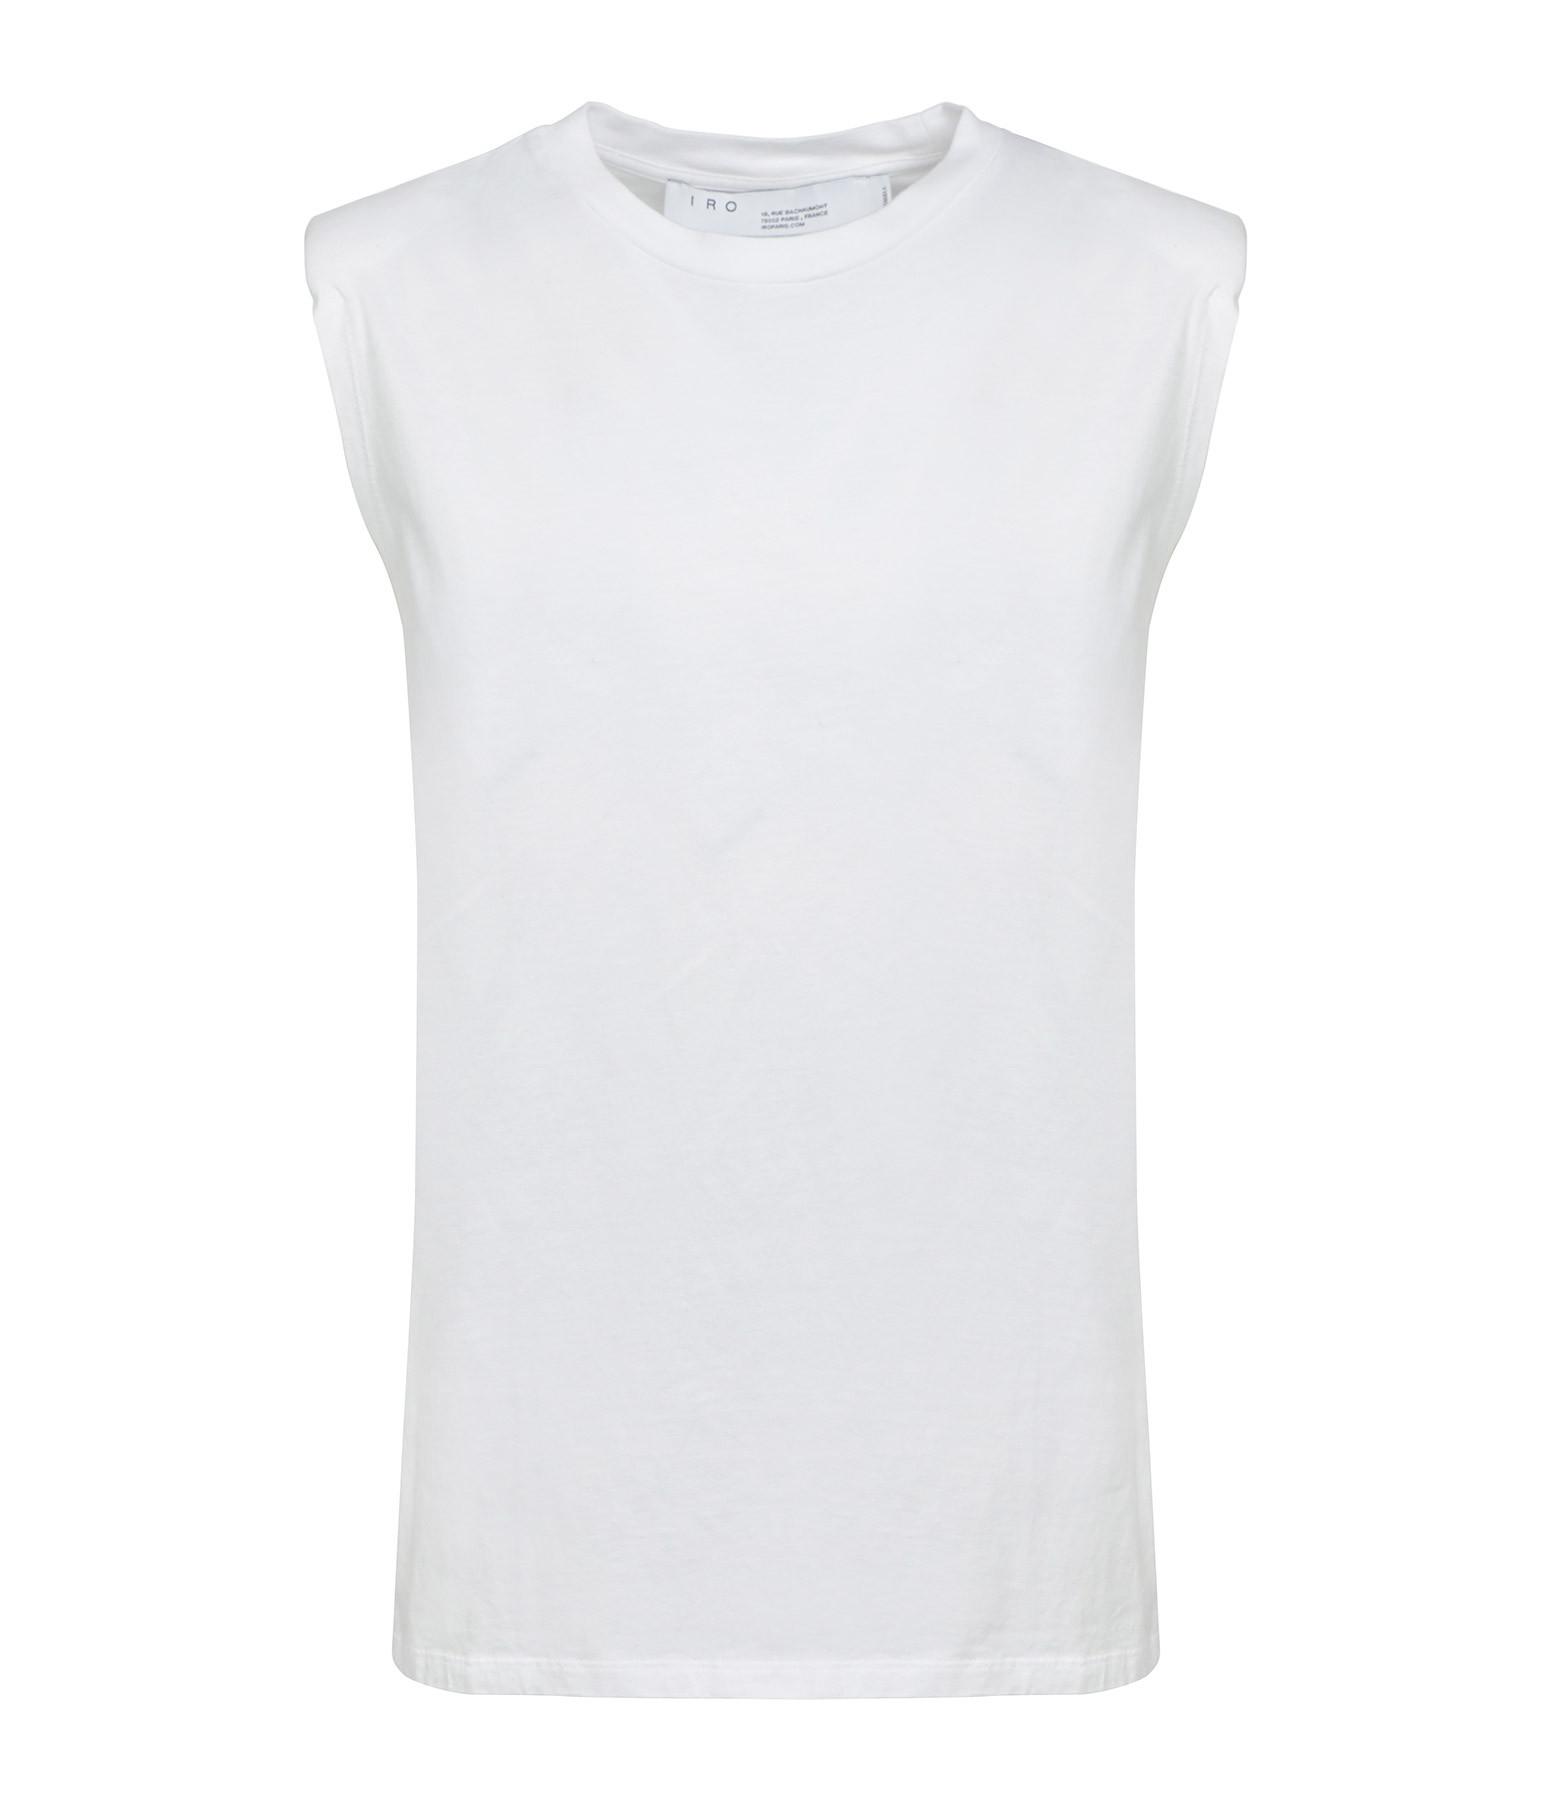 IRO - Top Loud Coton Blanc